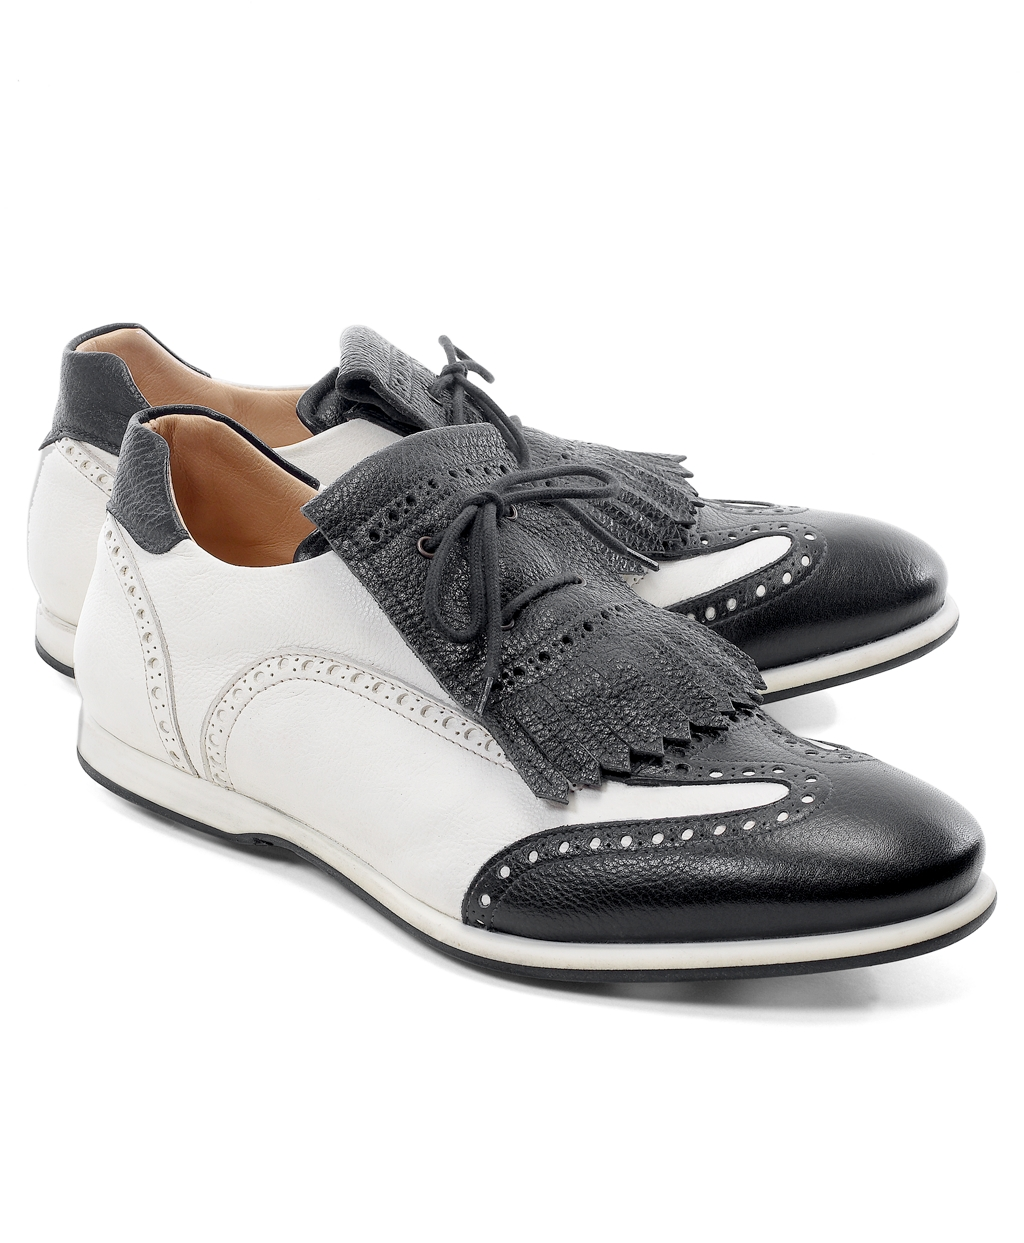 Golf White Pants Black Shoes